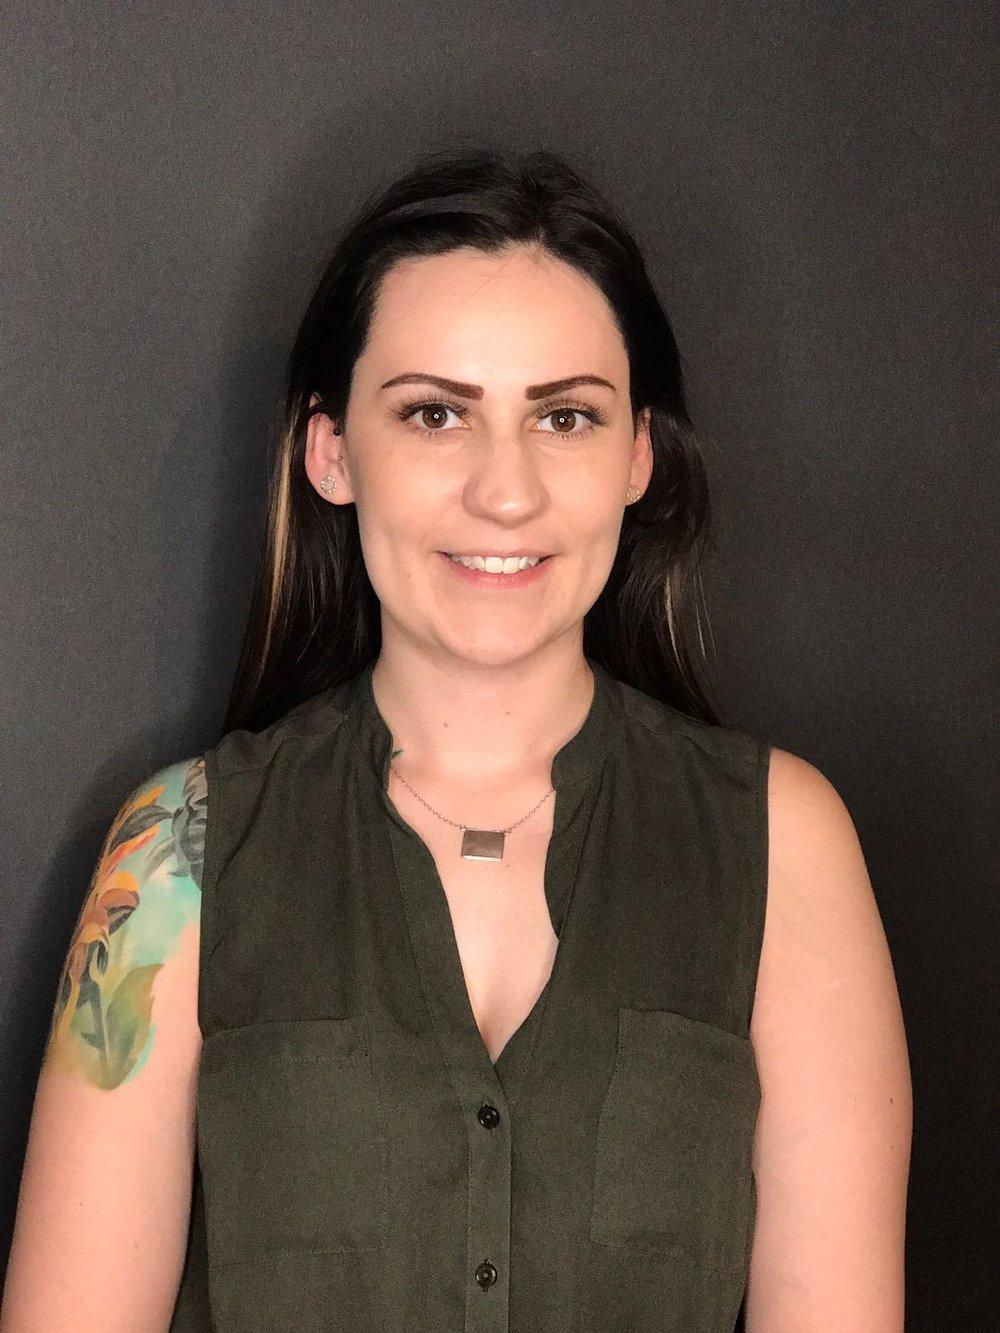 Rebekah SkinnerAccounts Assistant -